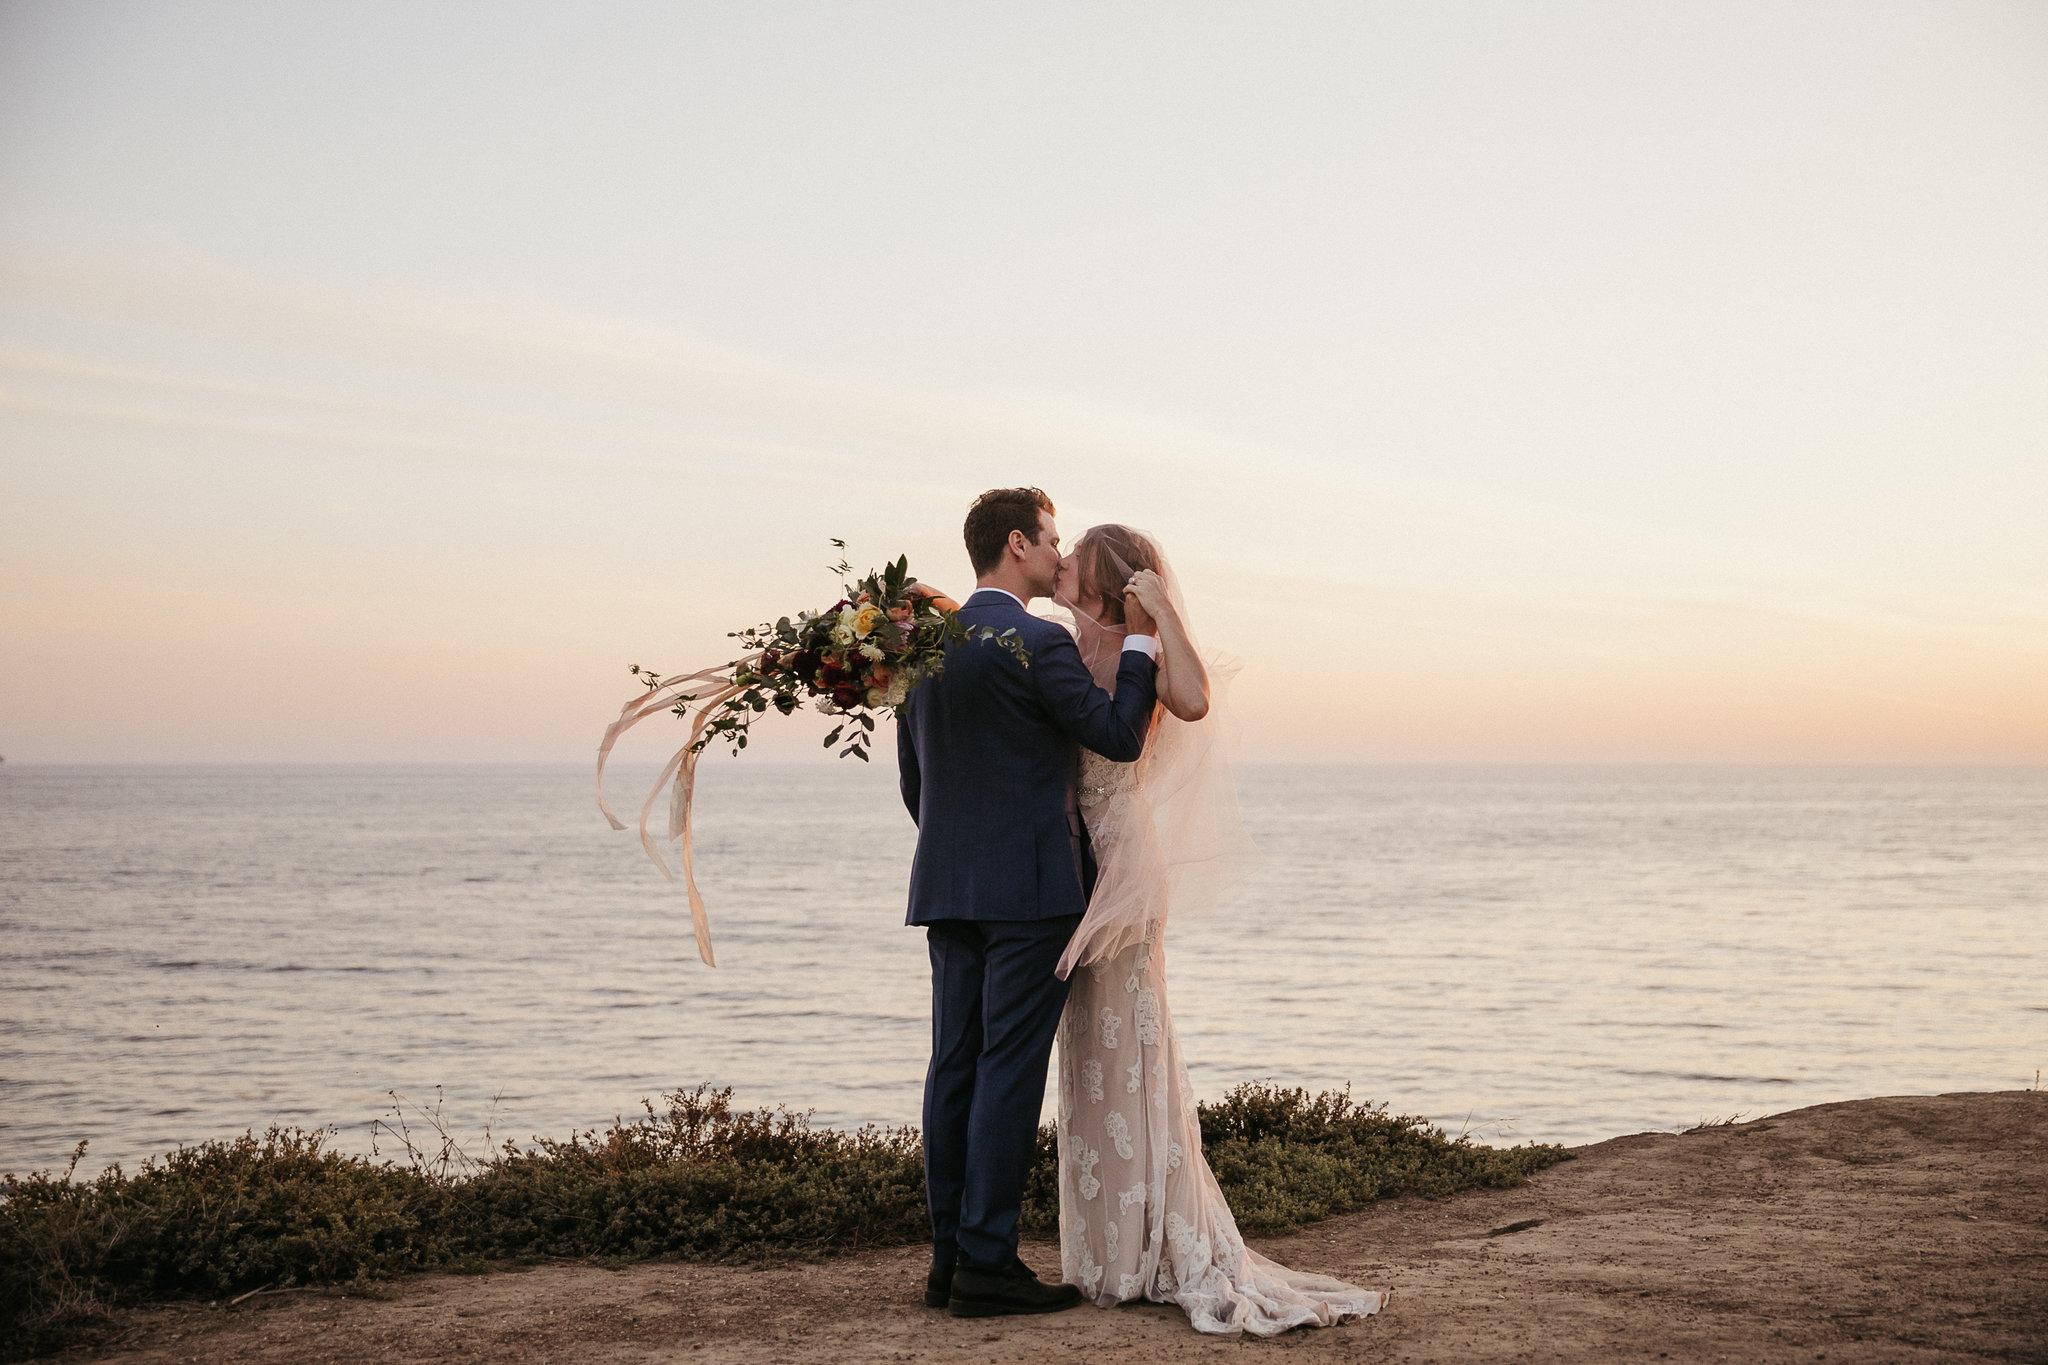 santa-barbara-elopement-wedding-planner-planning-coordinator-day-of-ellwood-bluff-ocean-front-view-bacara-resort-ritz-carlton-porsche-downtown (26).jpg